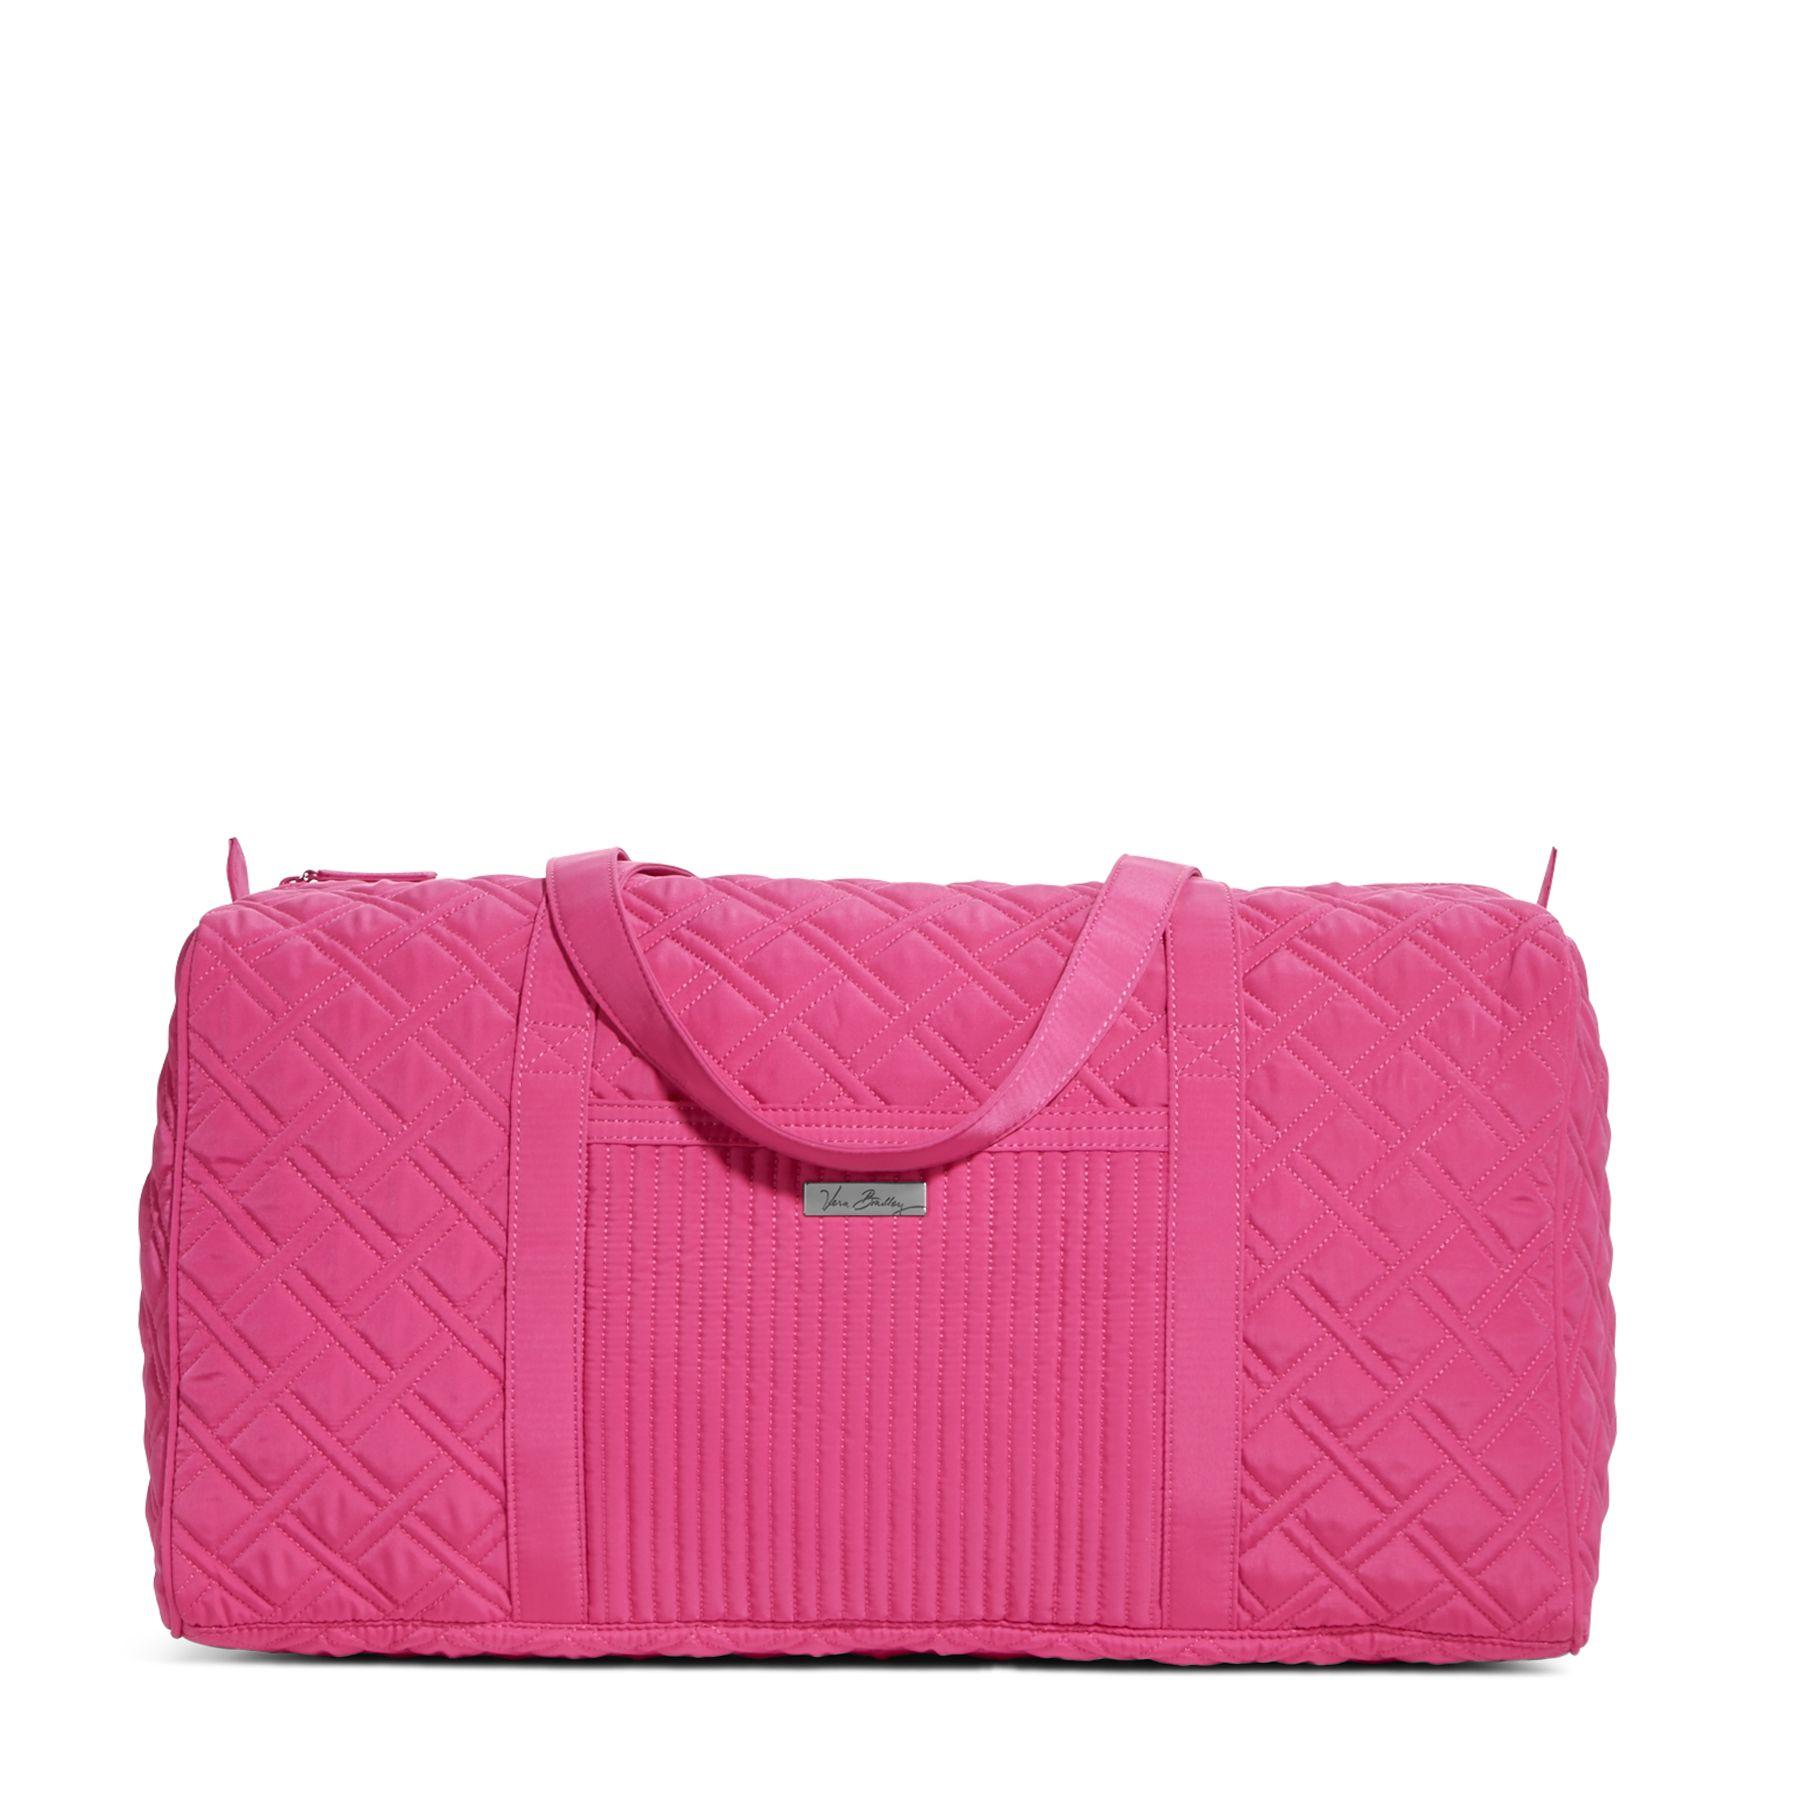 Vera Bradley Large Duffel Travel Bag in Fuchsia